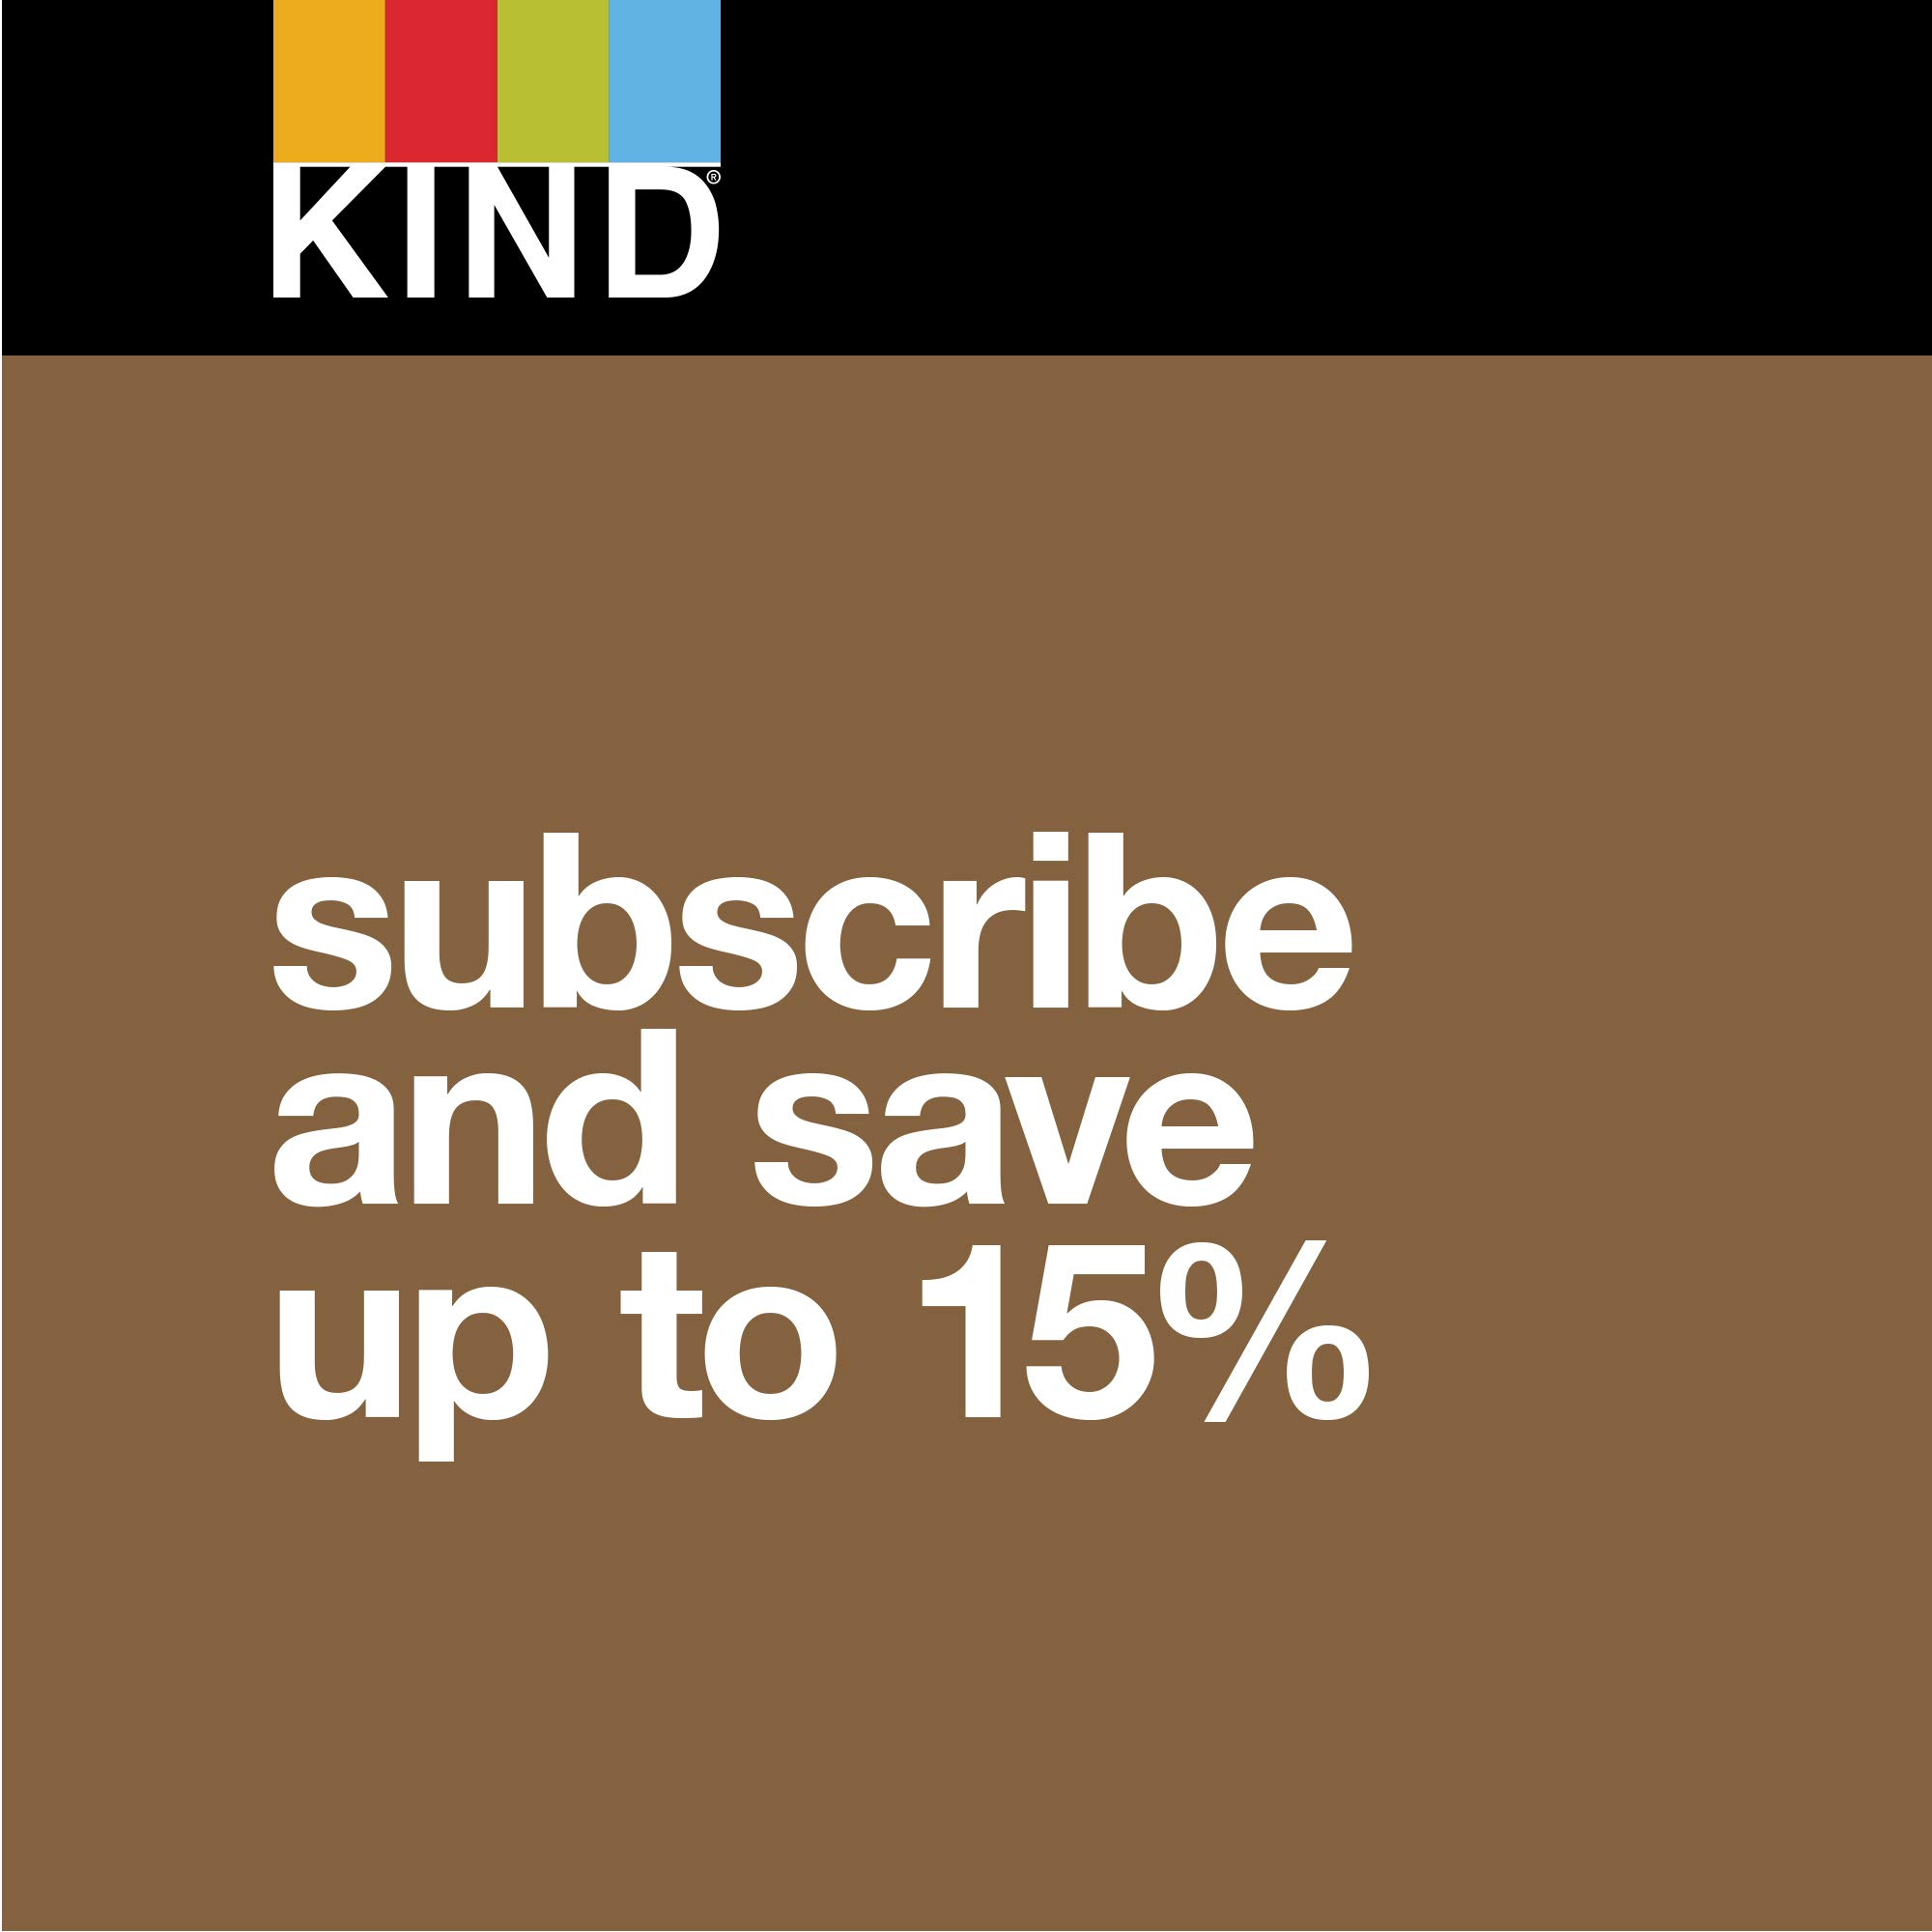 KIND Bars, Madagascar Vanilla Almond, Gluten Free, Low Sugar, 1.4oz, 12 Count by KIND (Image #7)